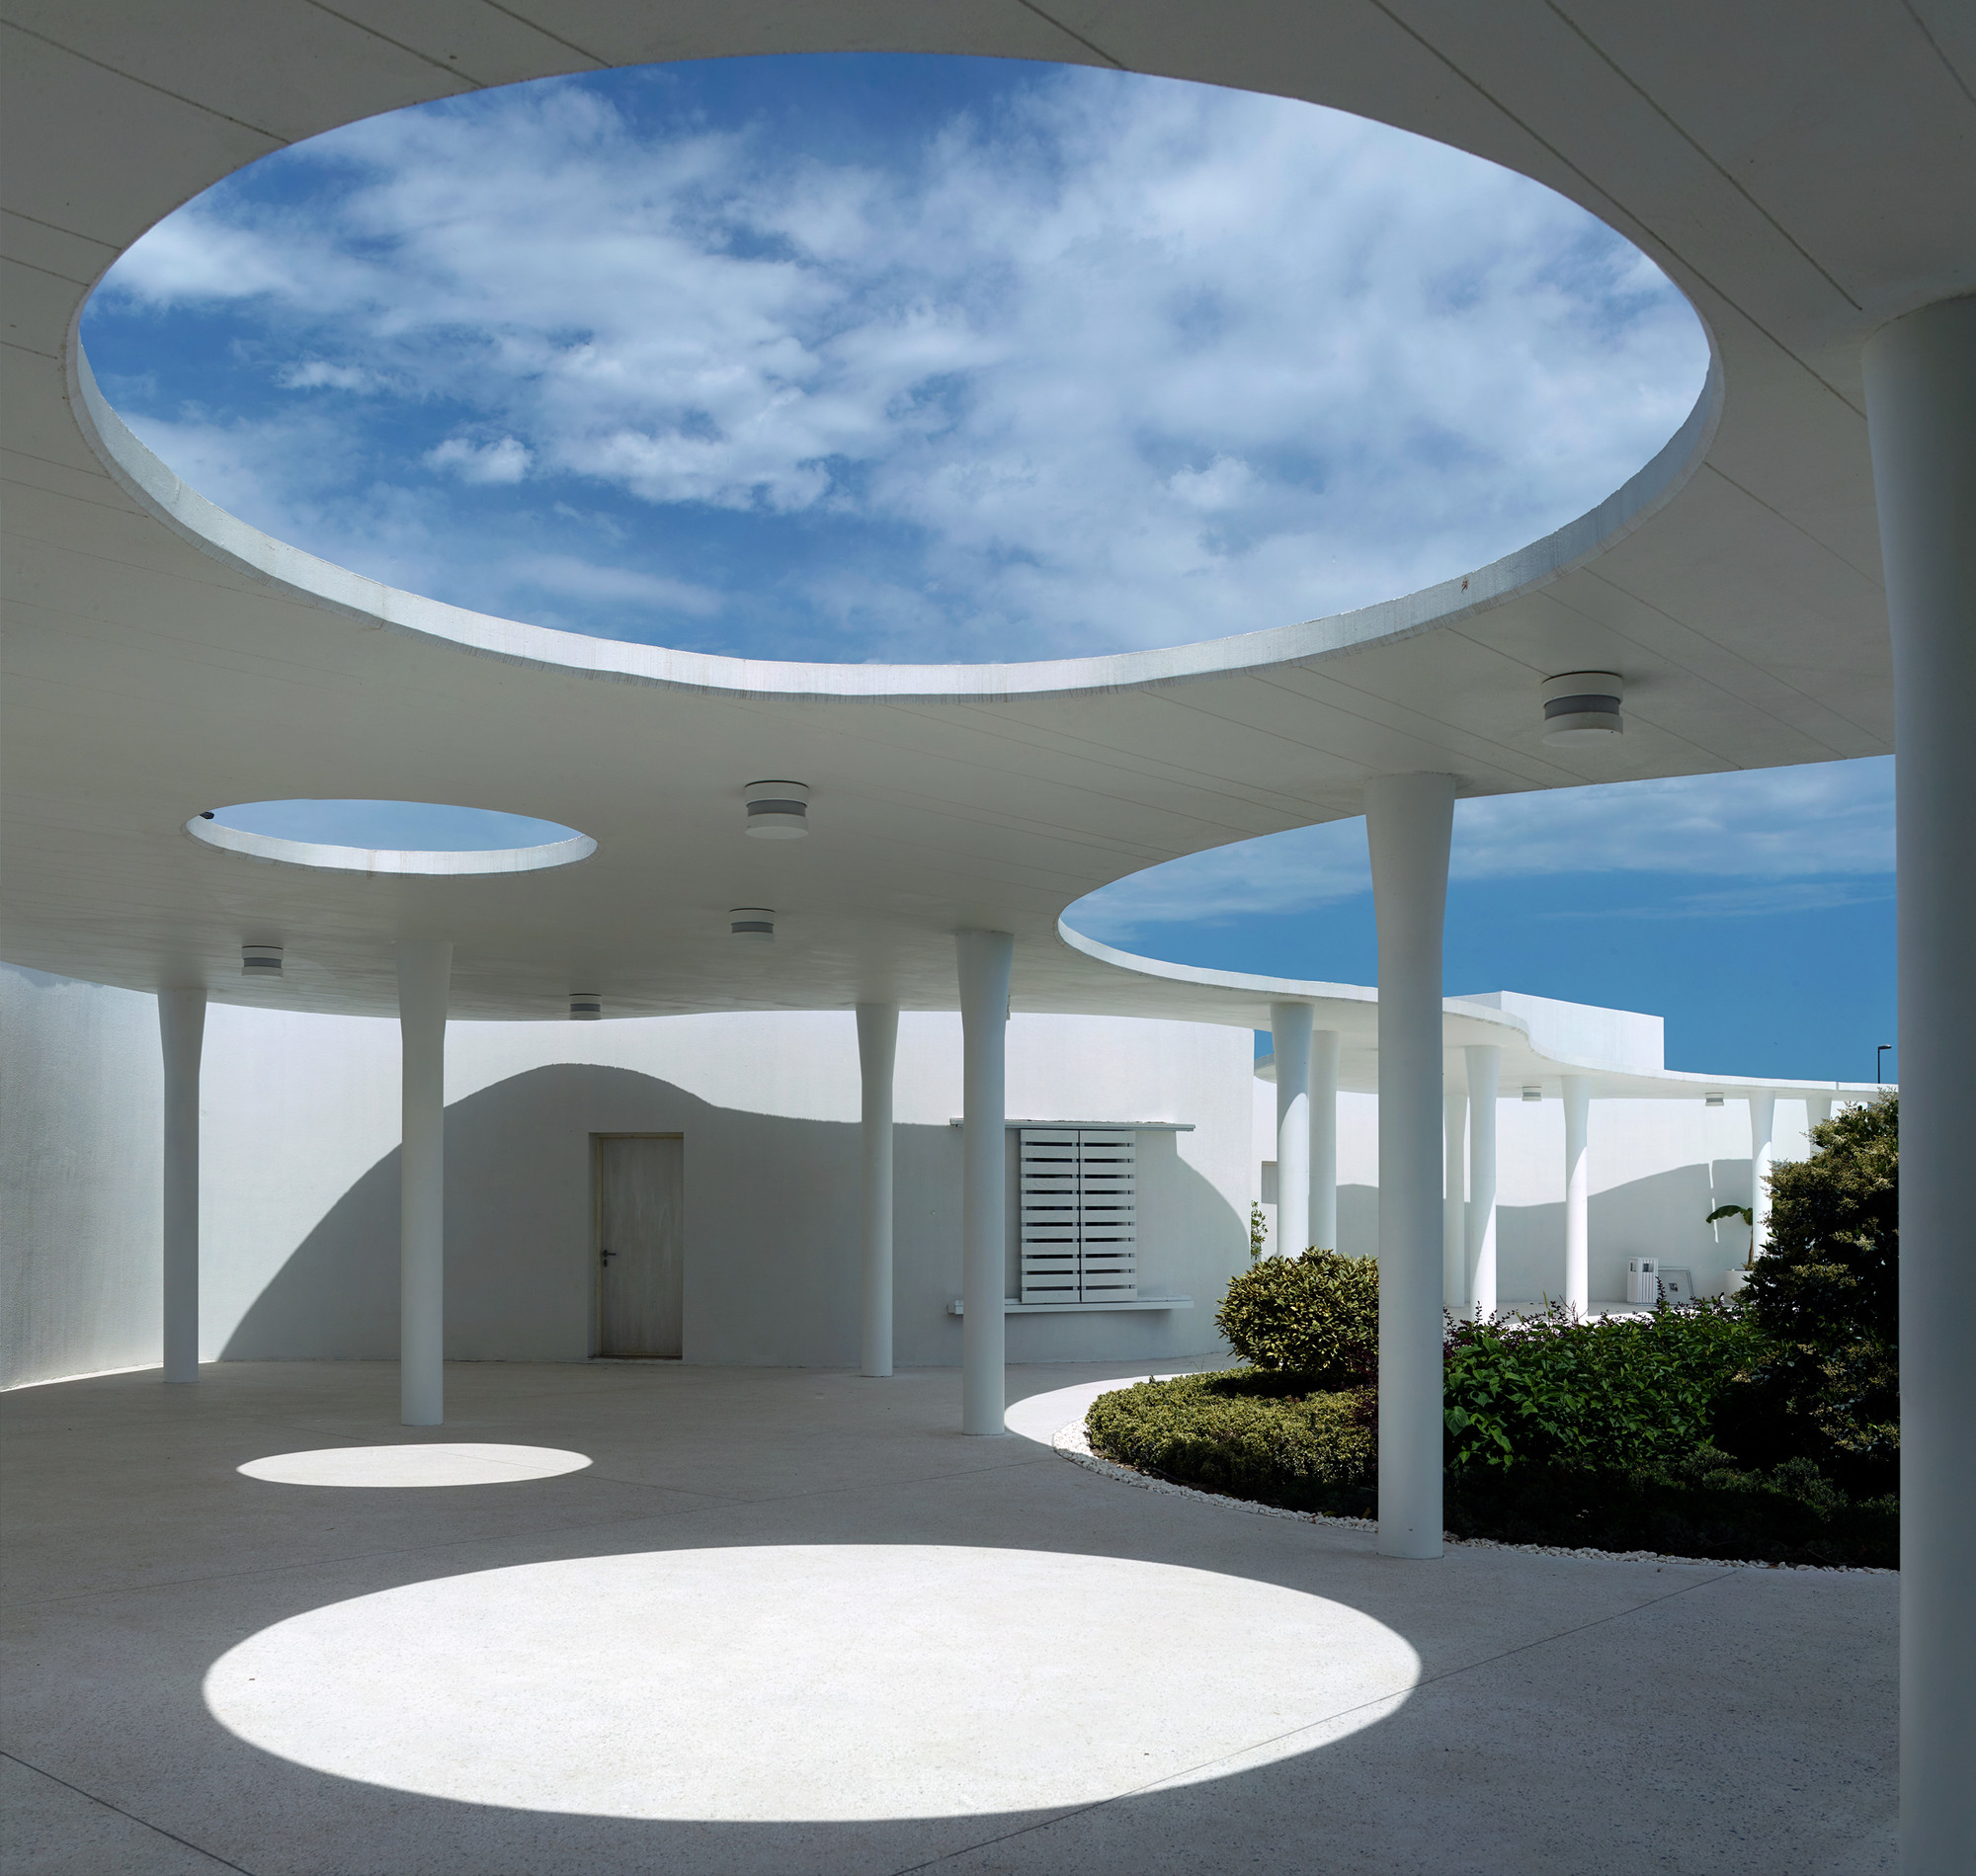 Amburan Beach / Erginoğlu & Çalışlar Architects, © Cemal Emden